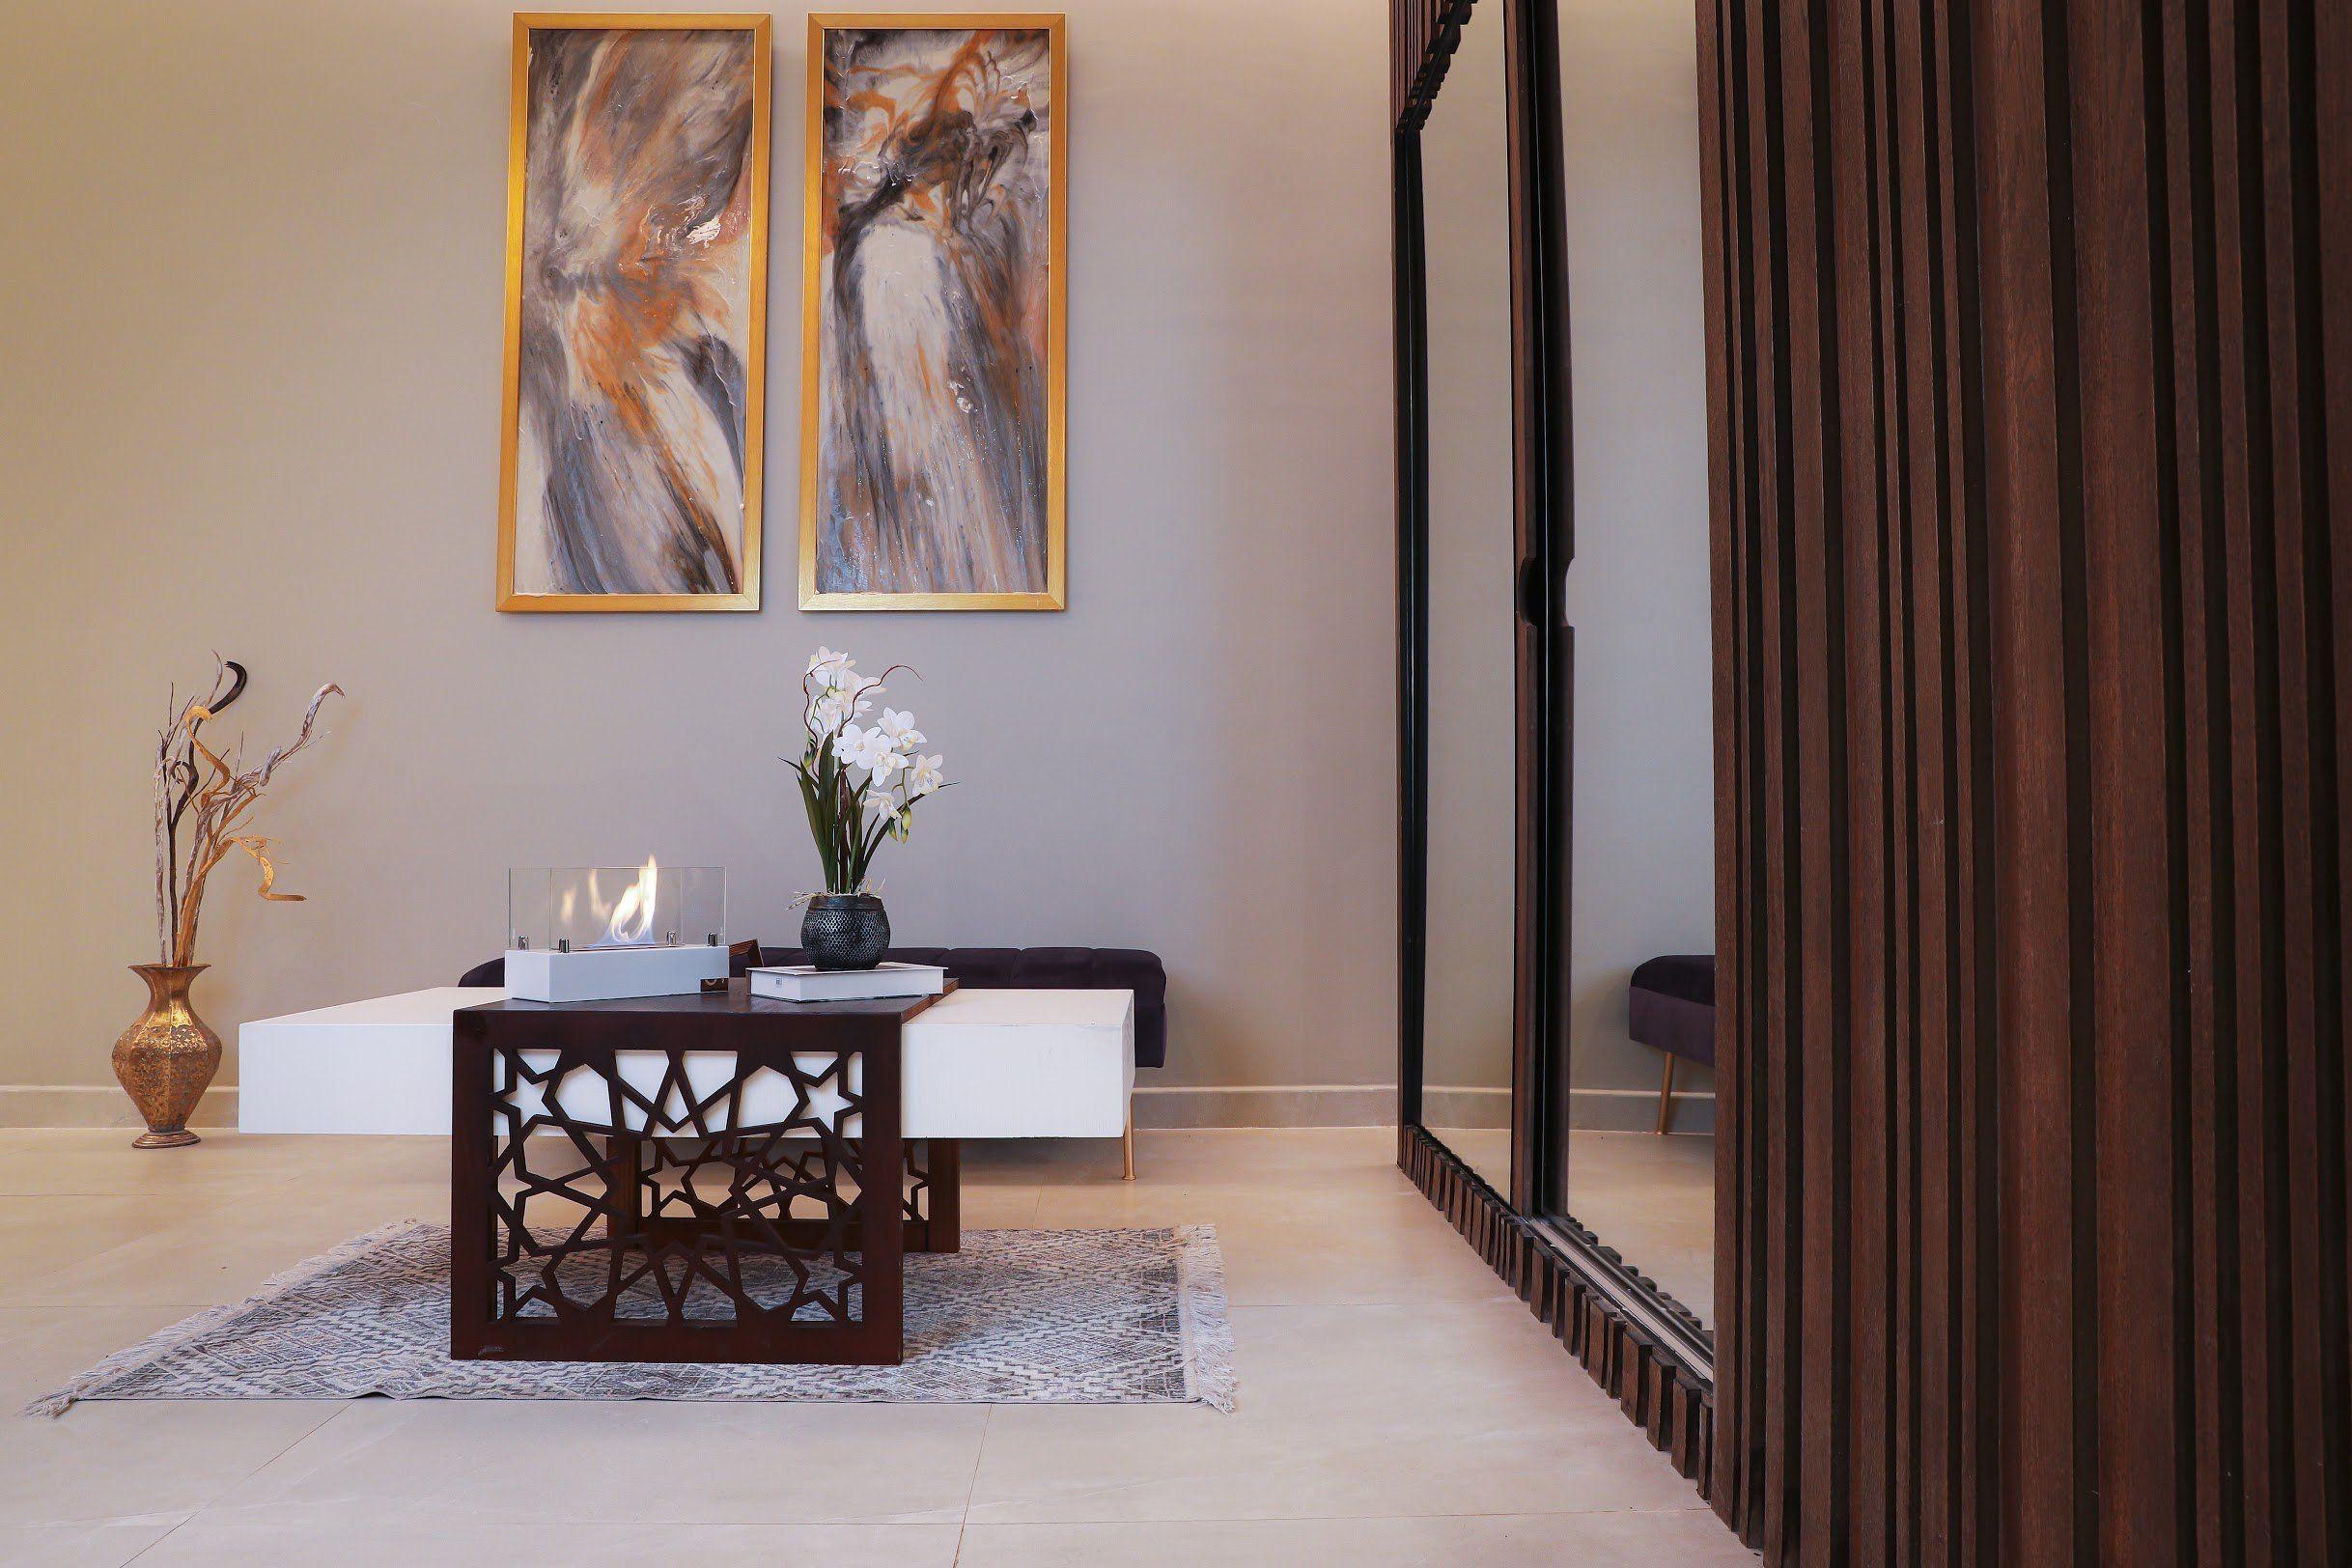 Pin By Talal On حسابات Decor Home Decor Home